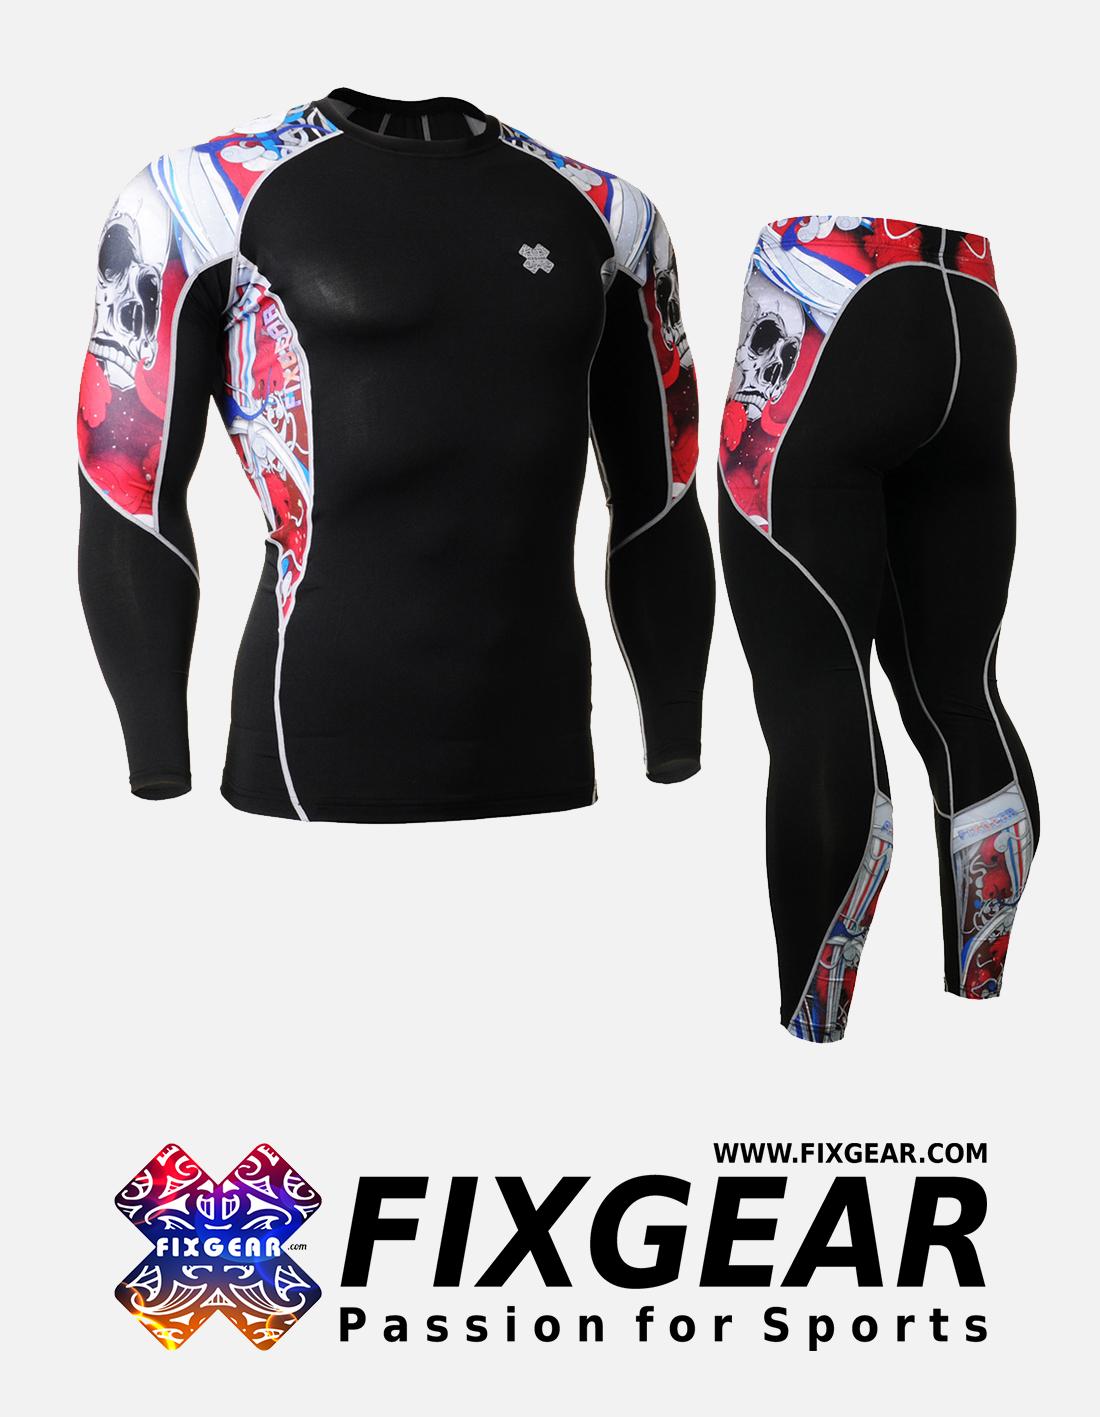 FIXGEAR C2L-P2L-B19R Set Compression Base Layer Shirt & Legging Pants